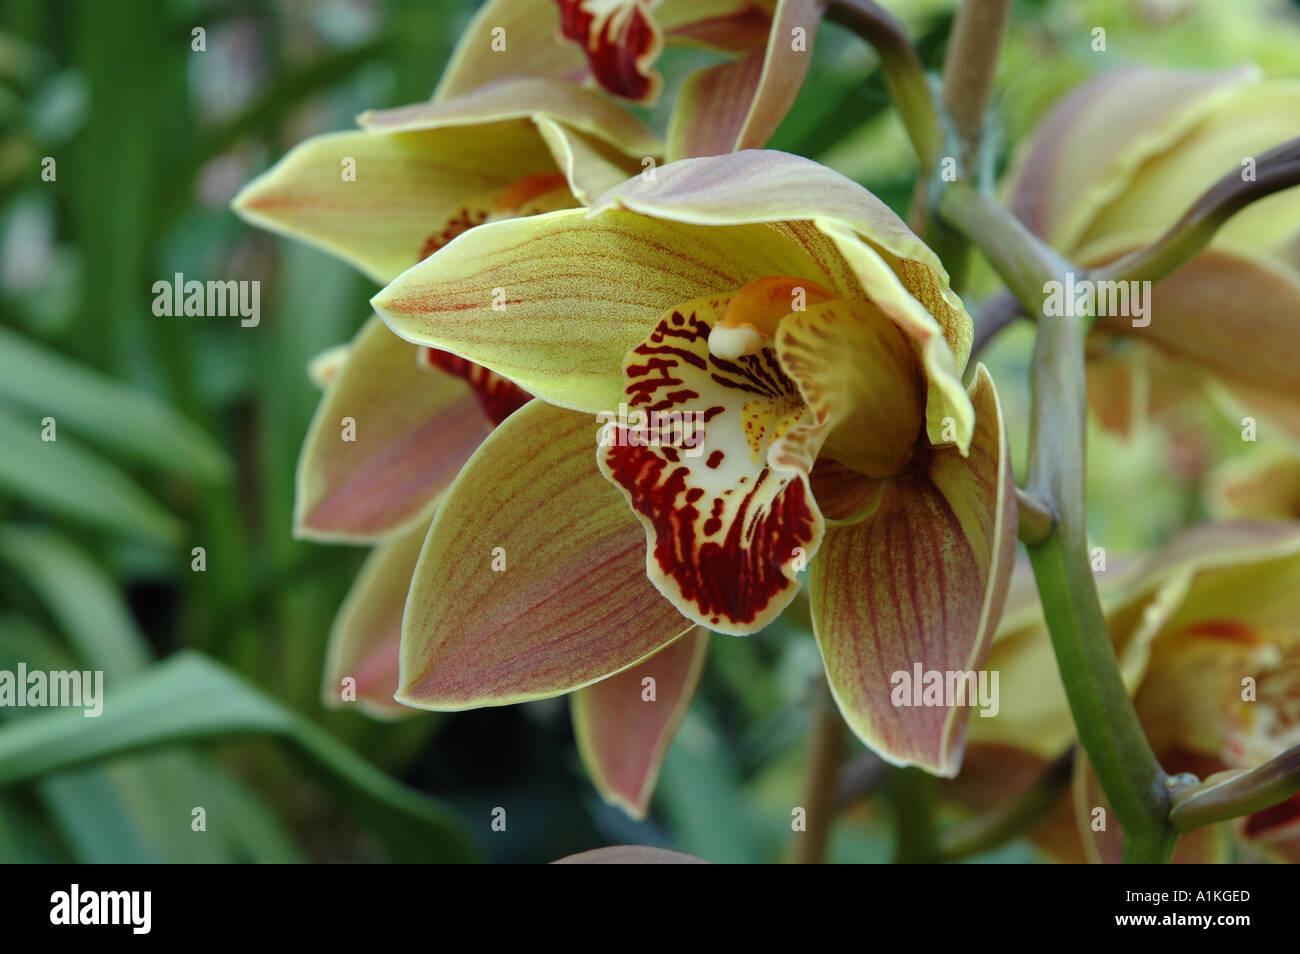 Cymbidium Sparkie Polychrome Tropical orchid flowers - Stock Image